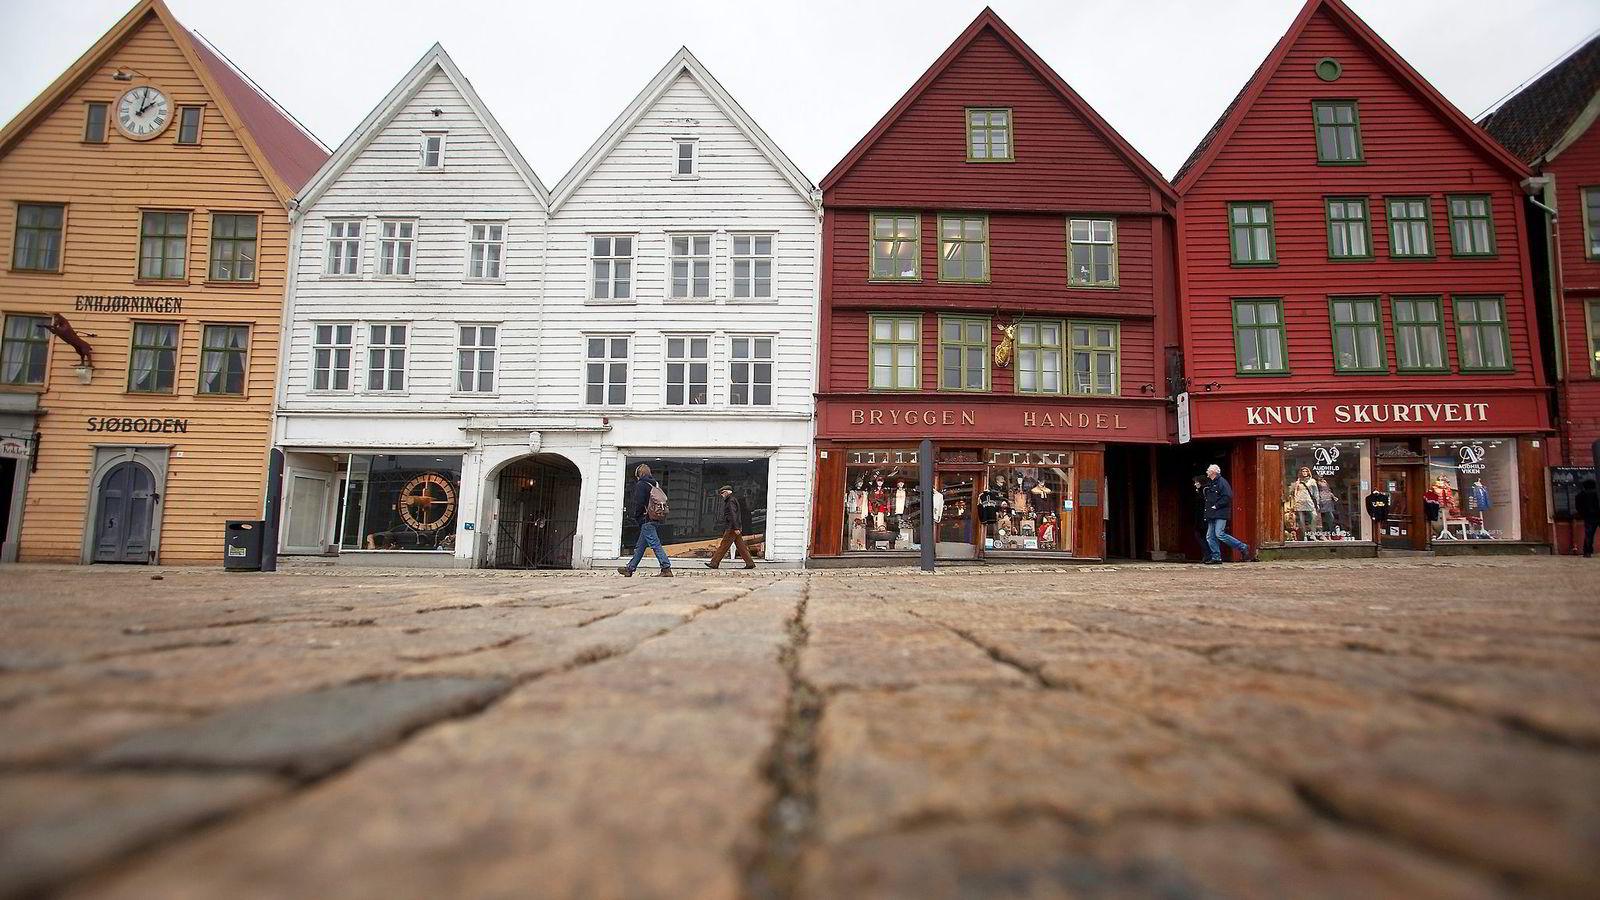 da707cf86 Redd Bergen, send bybanen over Bryggen» | DN